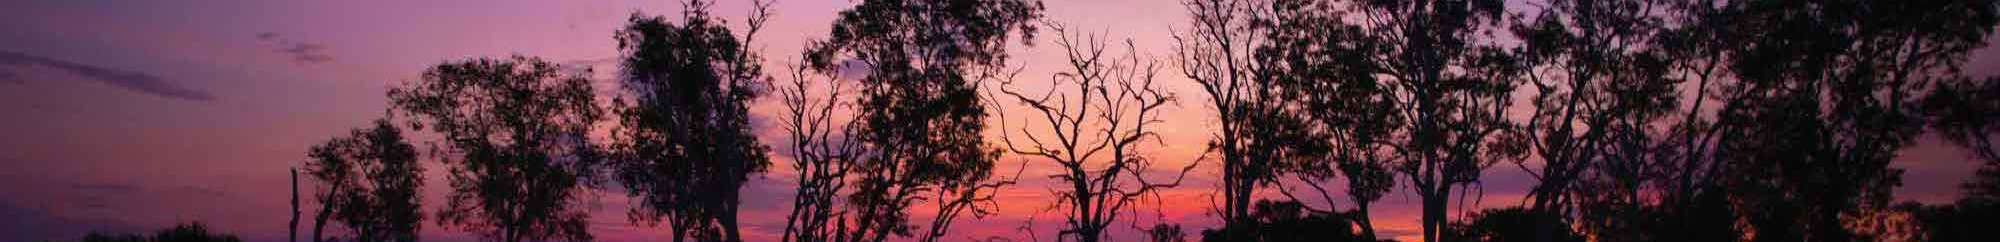 kakadu national park sunset